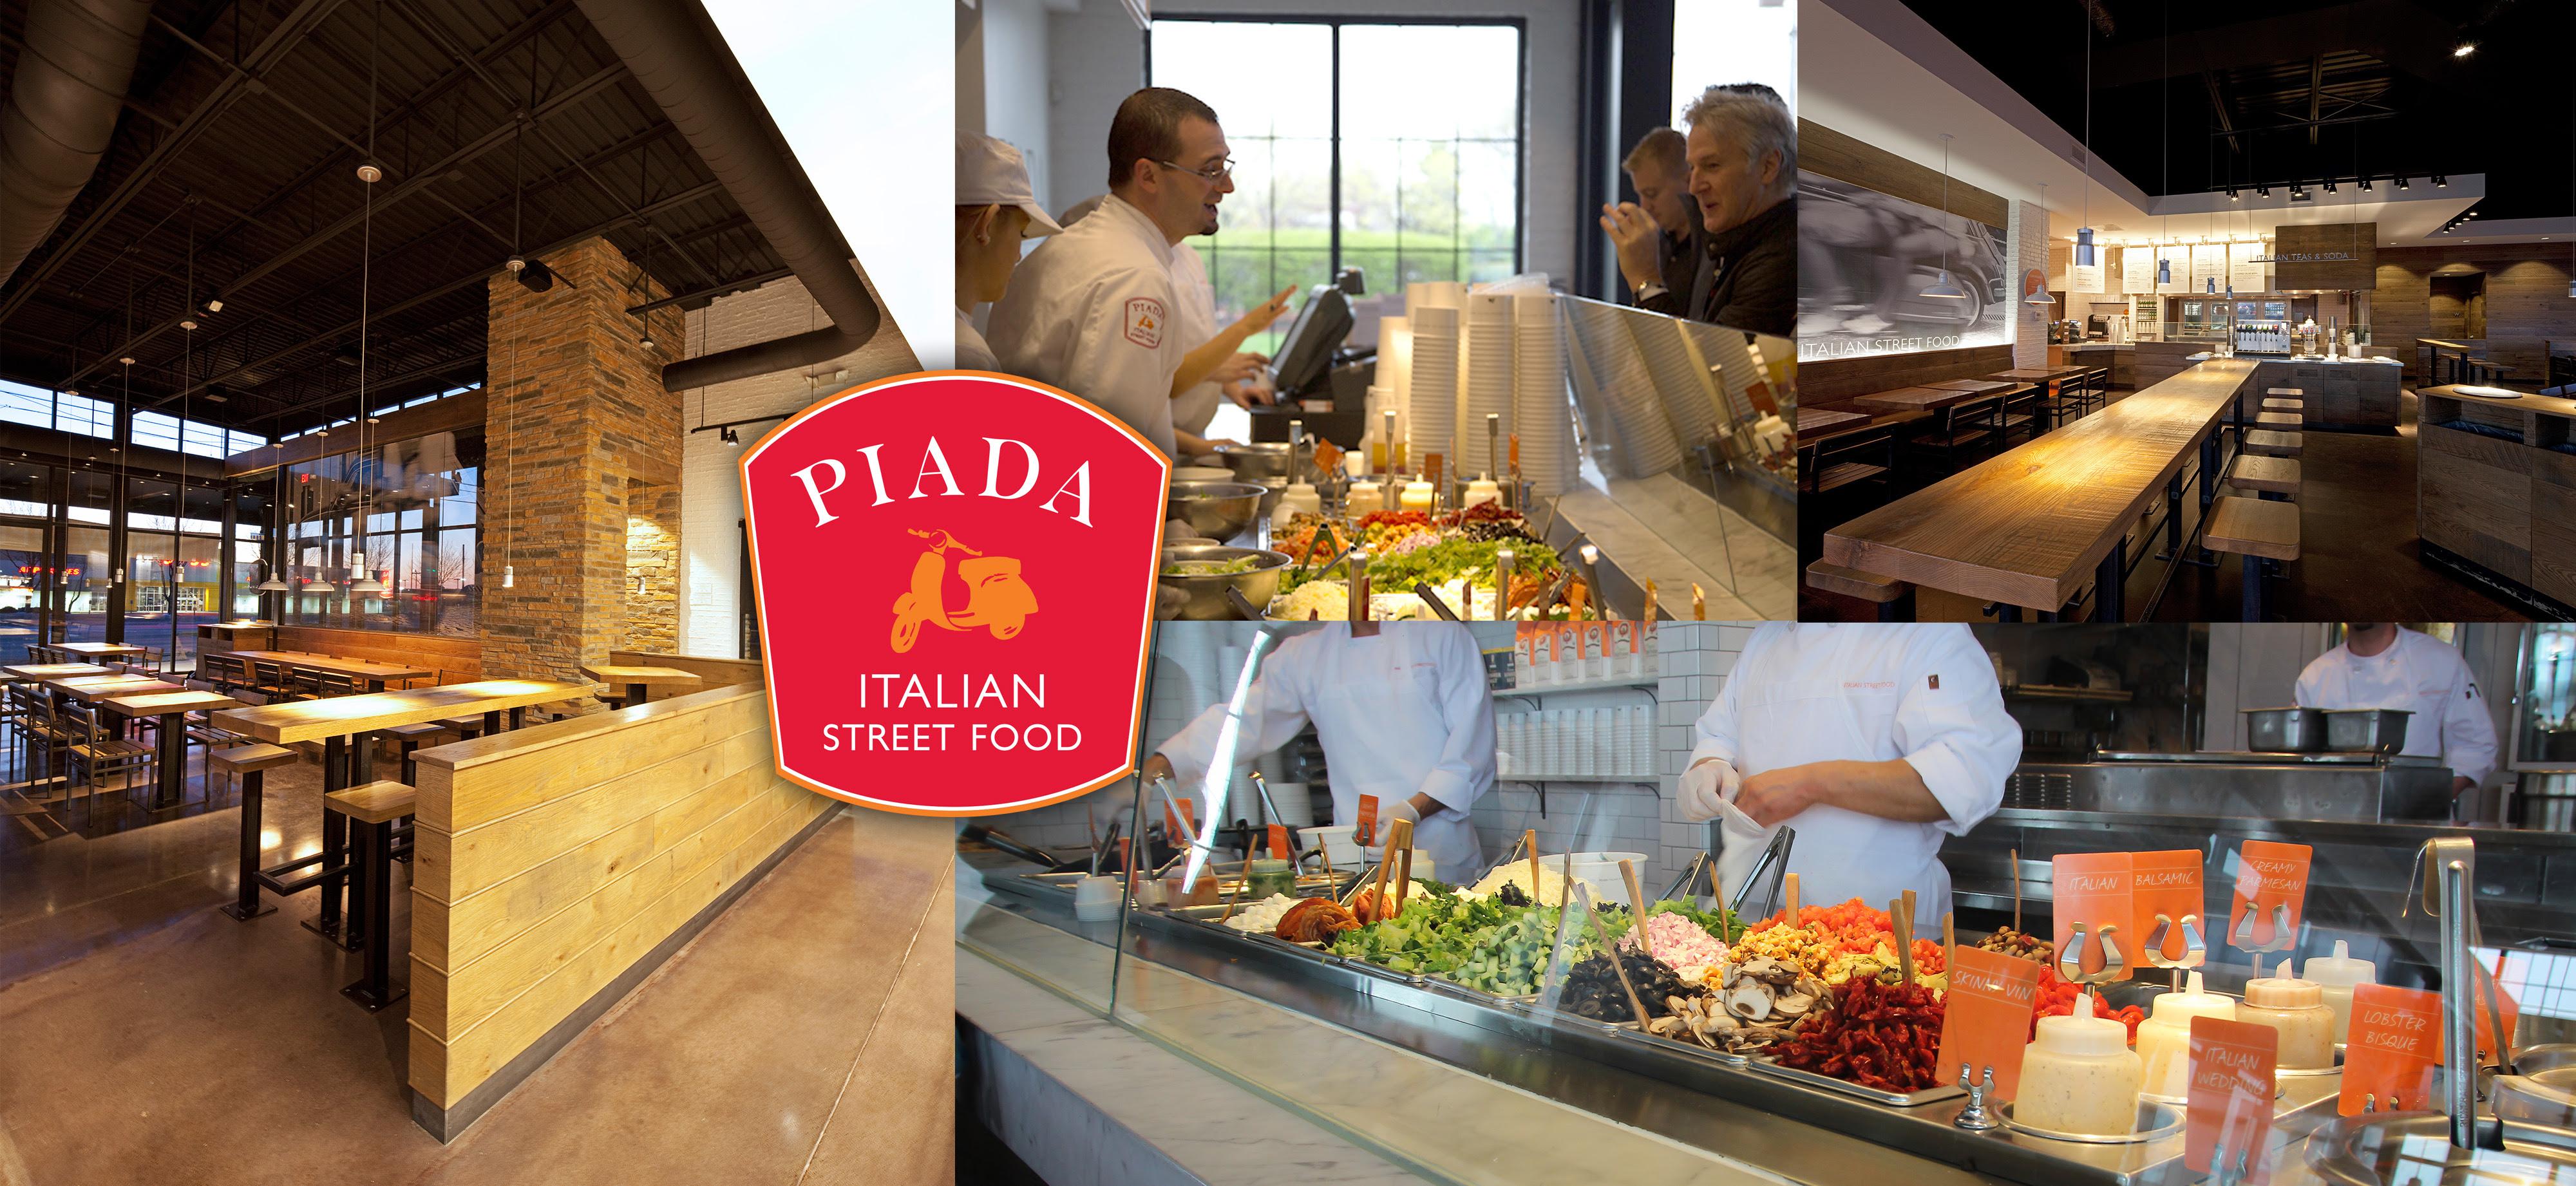 Piada Italian Street Food Opening 4 Restaurants in ...